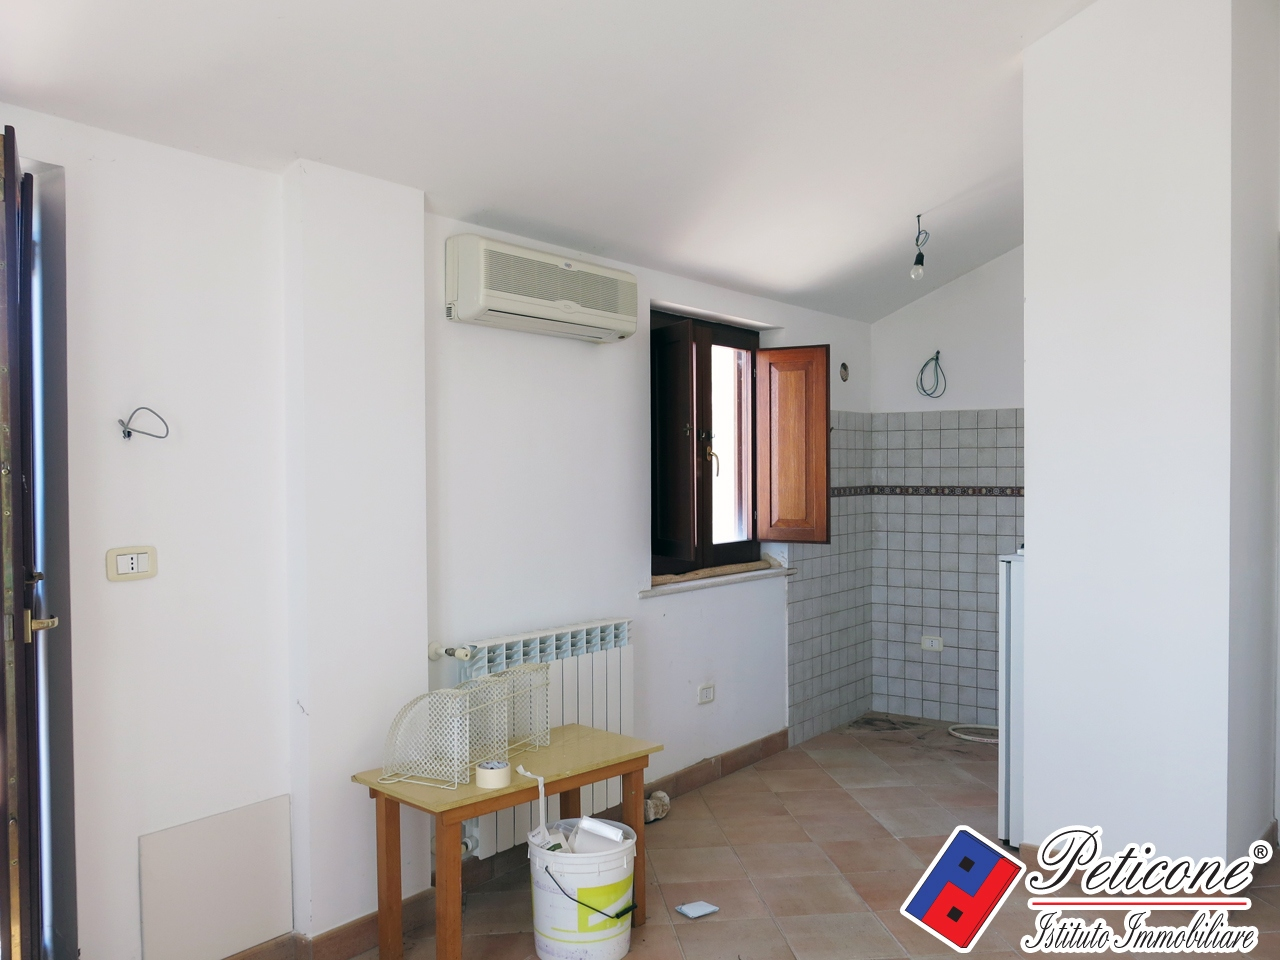 Villa in Vendita a Gaeta: 5 locali, 250 mq - Foto 14